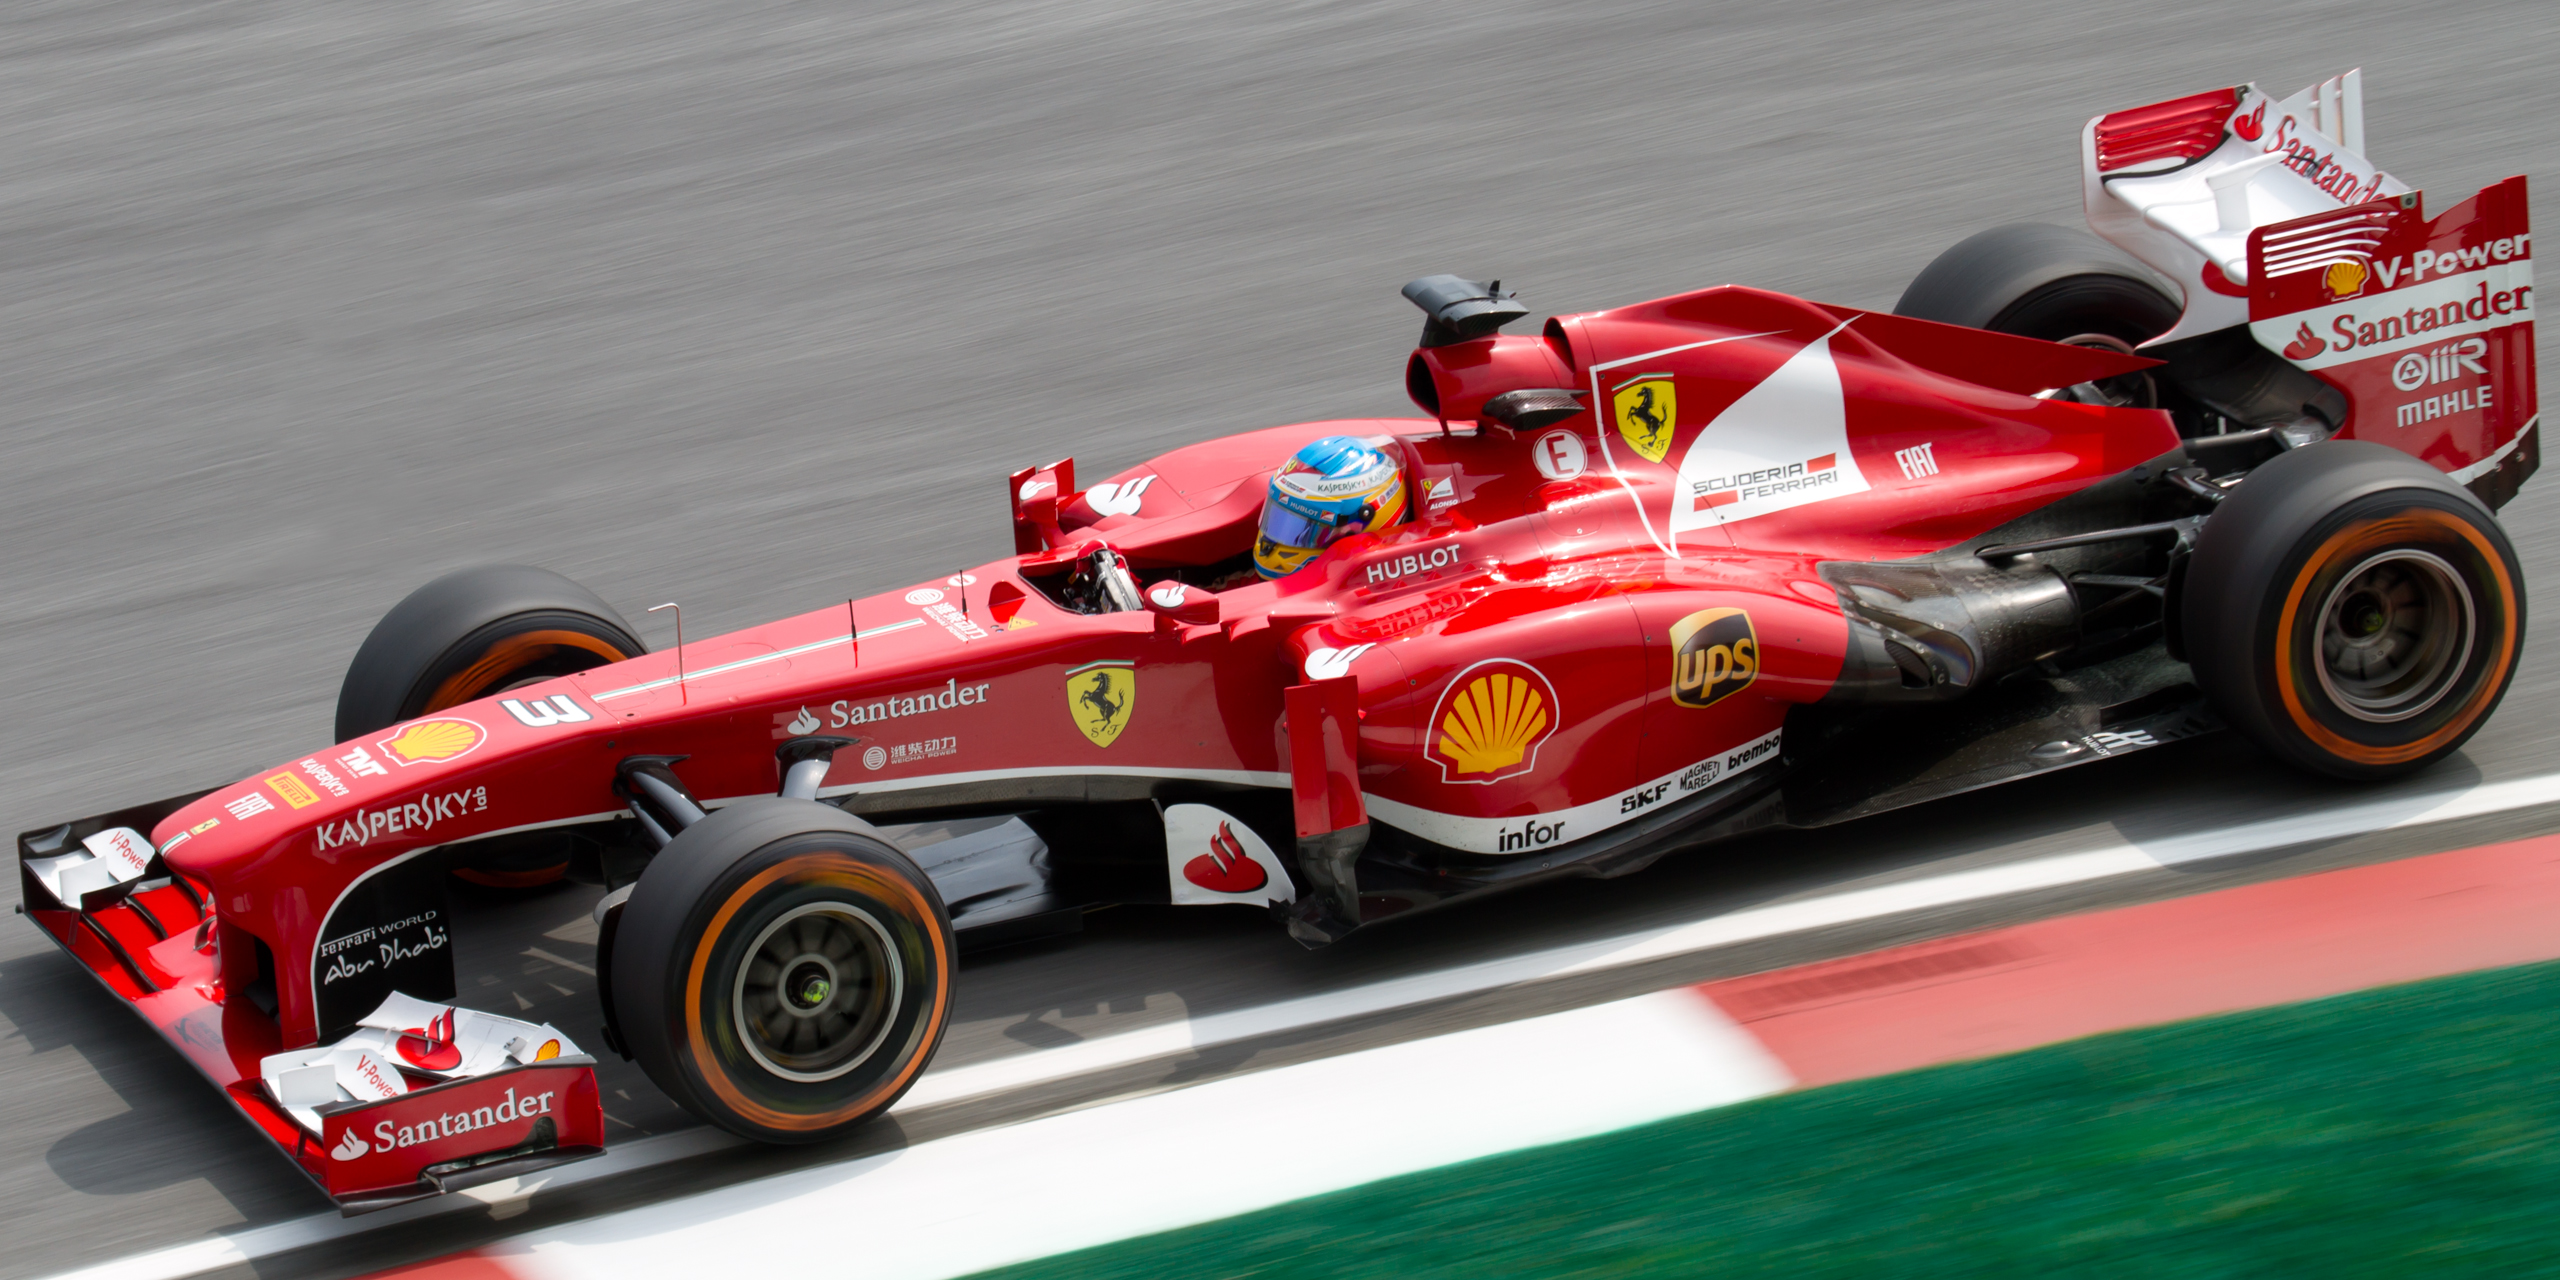 Ferrari in una sessione di test per mondiale (commons.wikimedia.org)